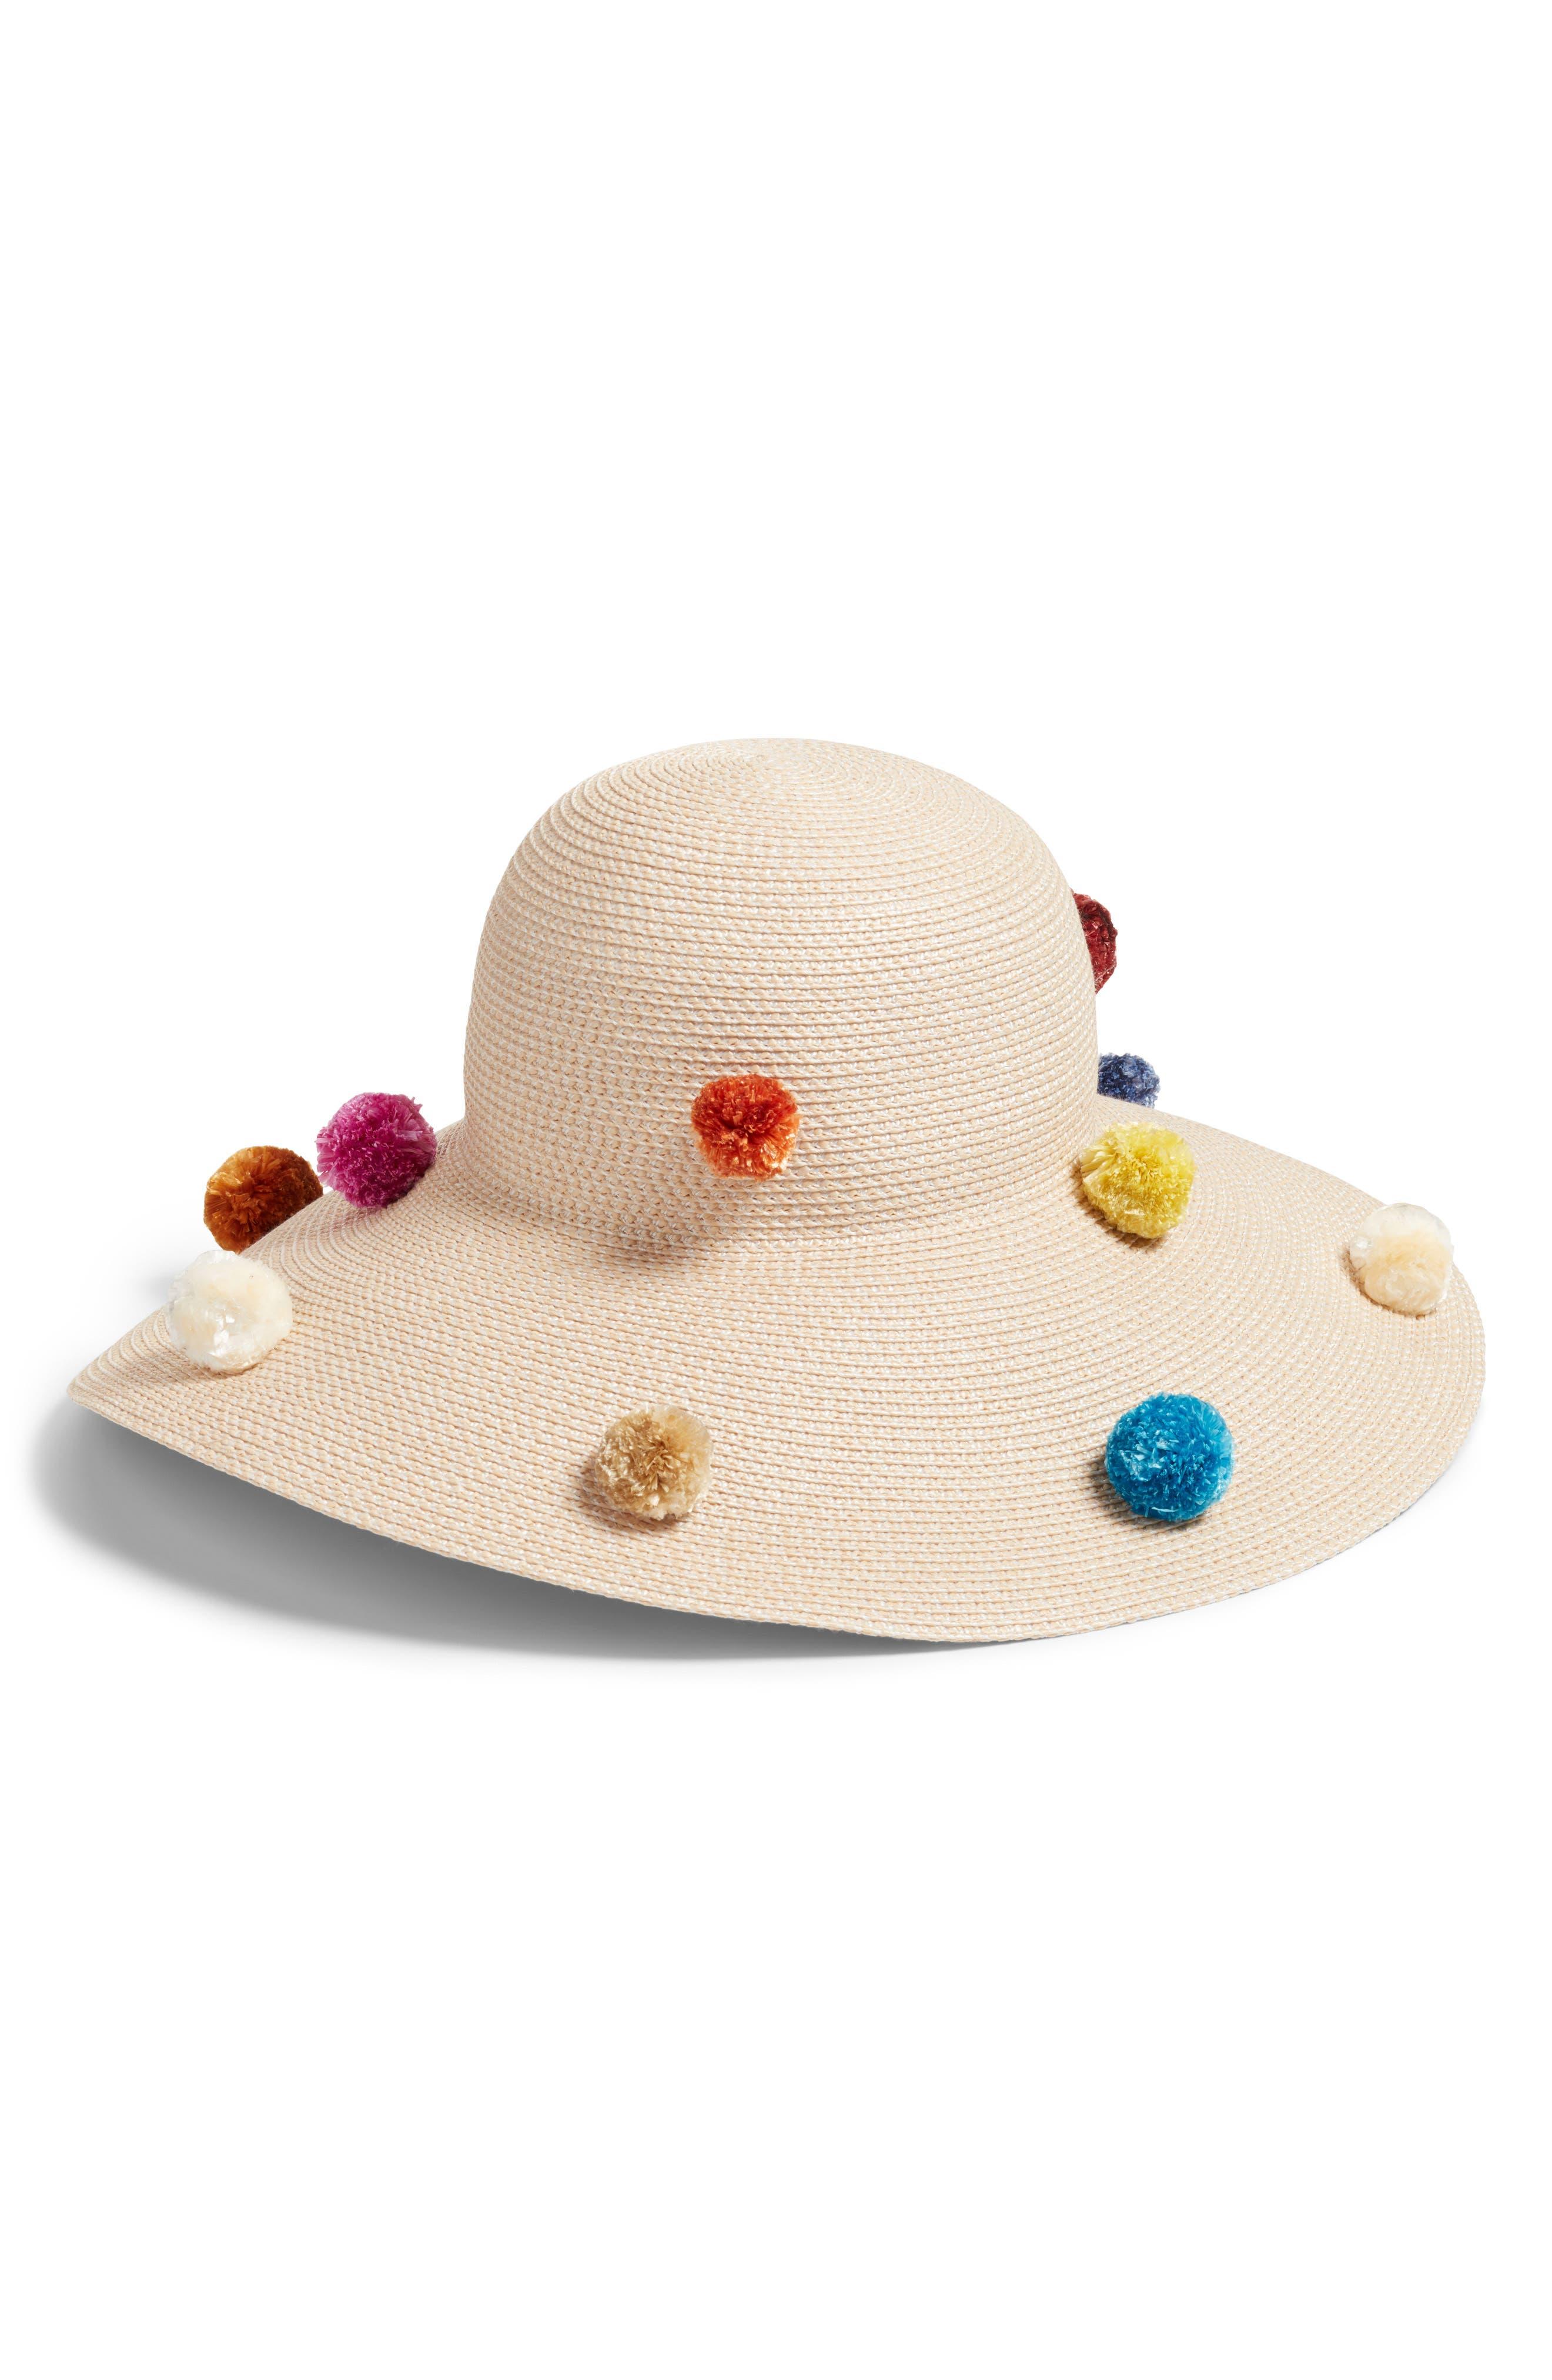 Pompom Bella Squishee<sup>®</sup> Sun Hat,                             Main thumbnail 1, color,                             Cream Mix